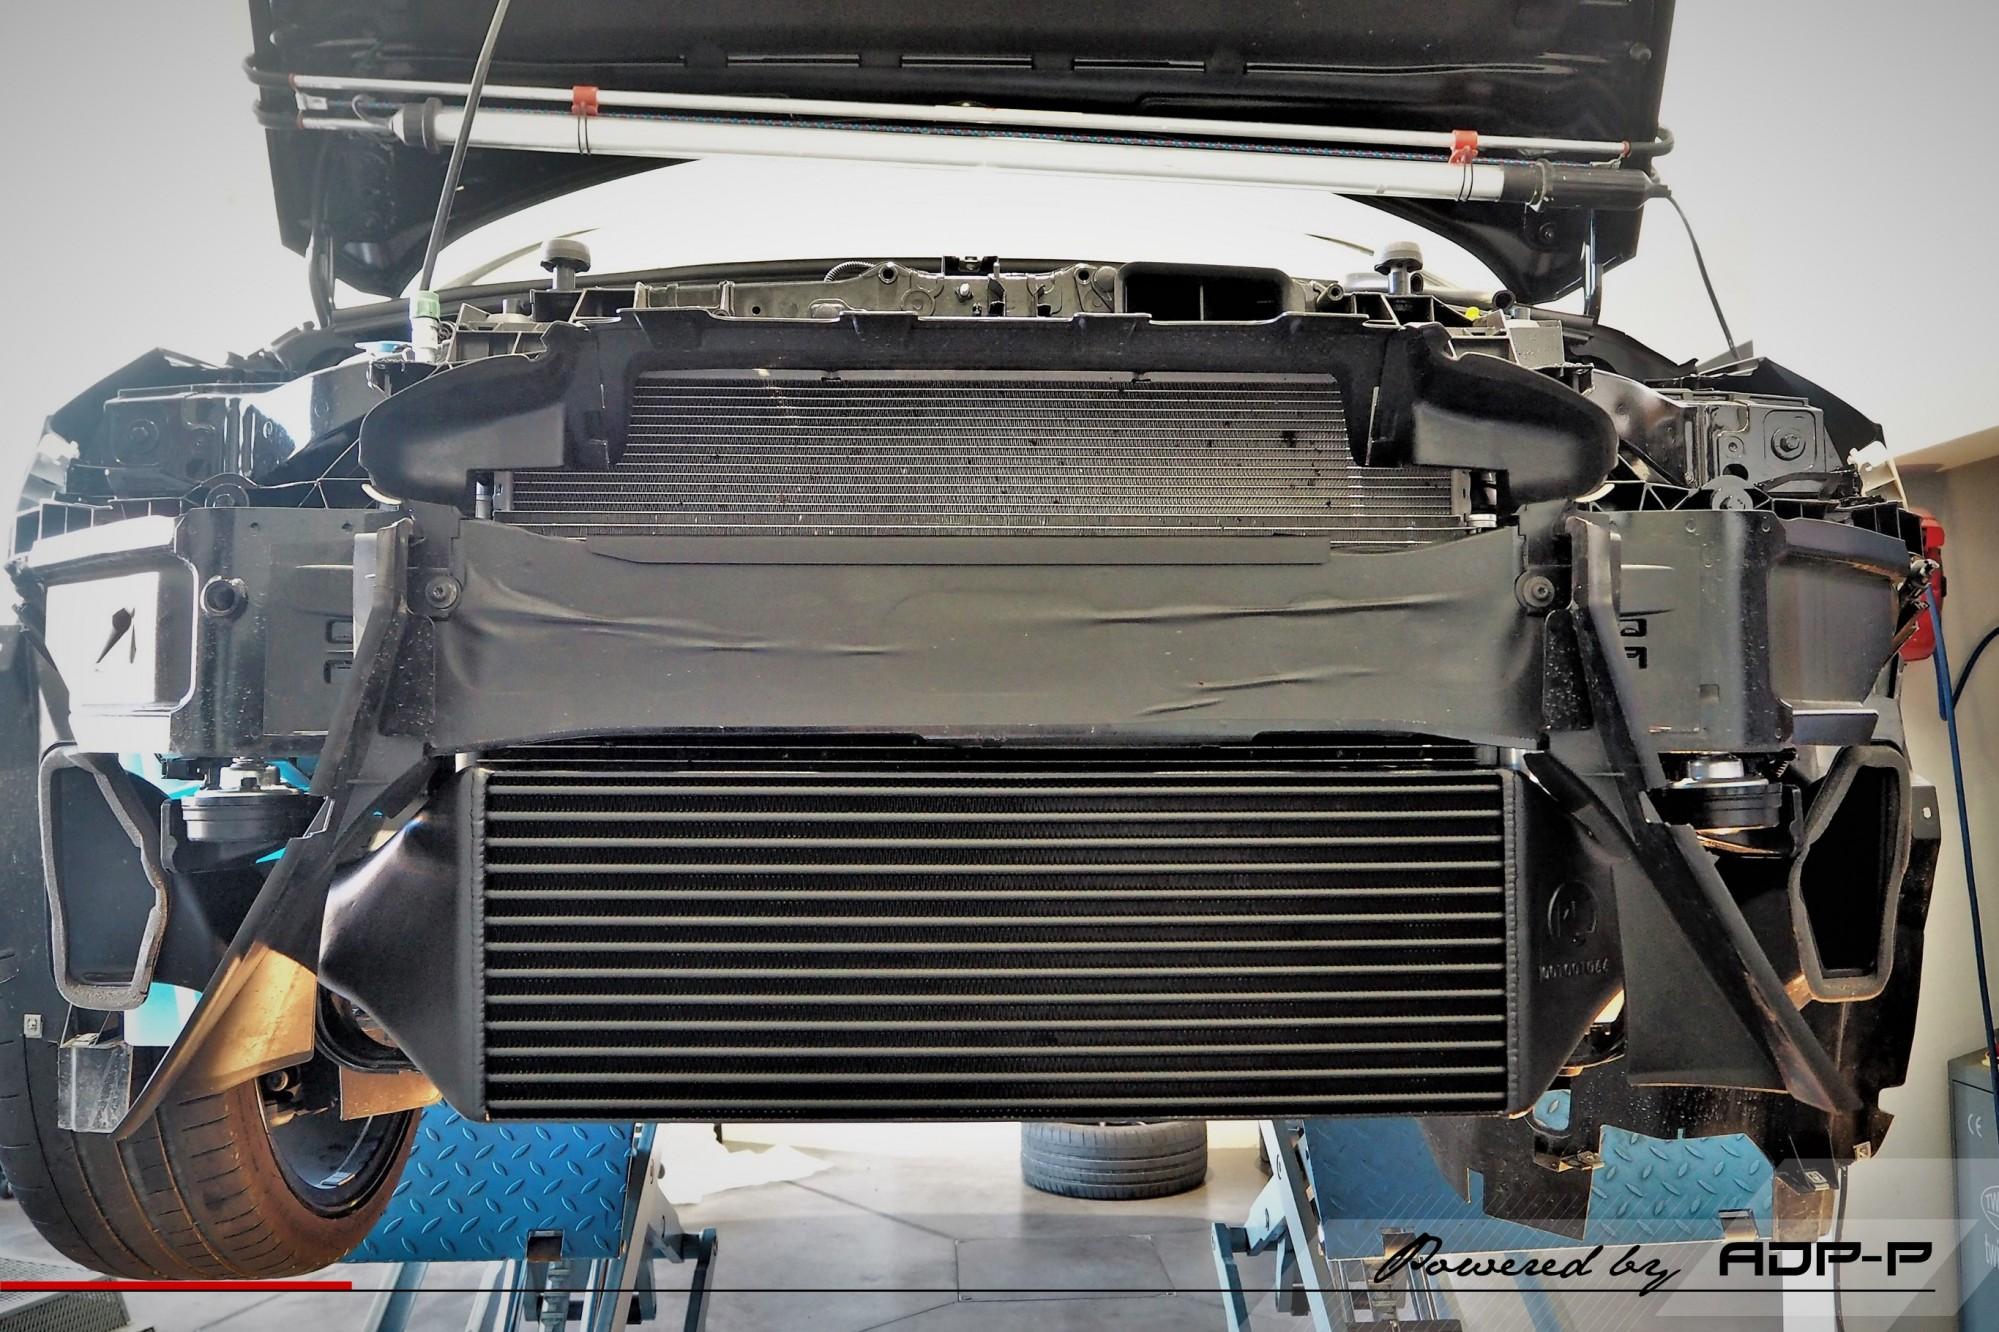 Echangeur Wagner Salon de Provence - Ford Focus RS 2.3T Ecoboost 350cv - ADP Performance